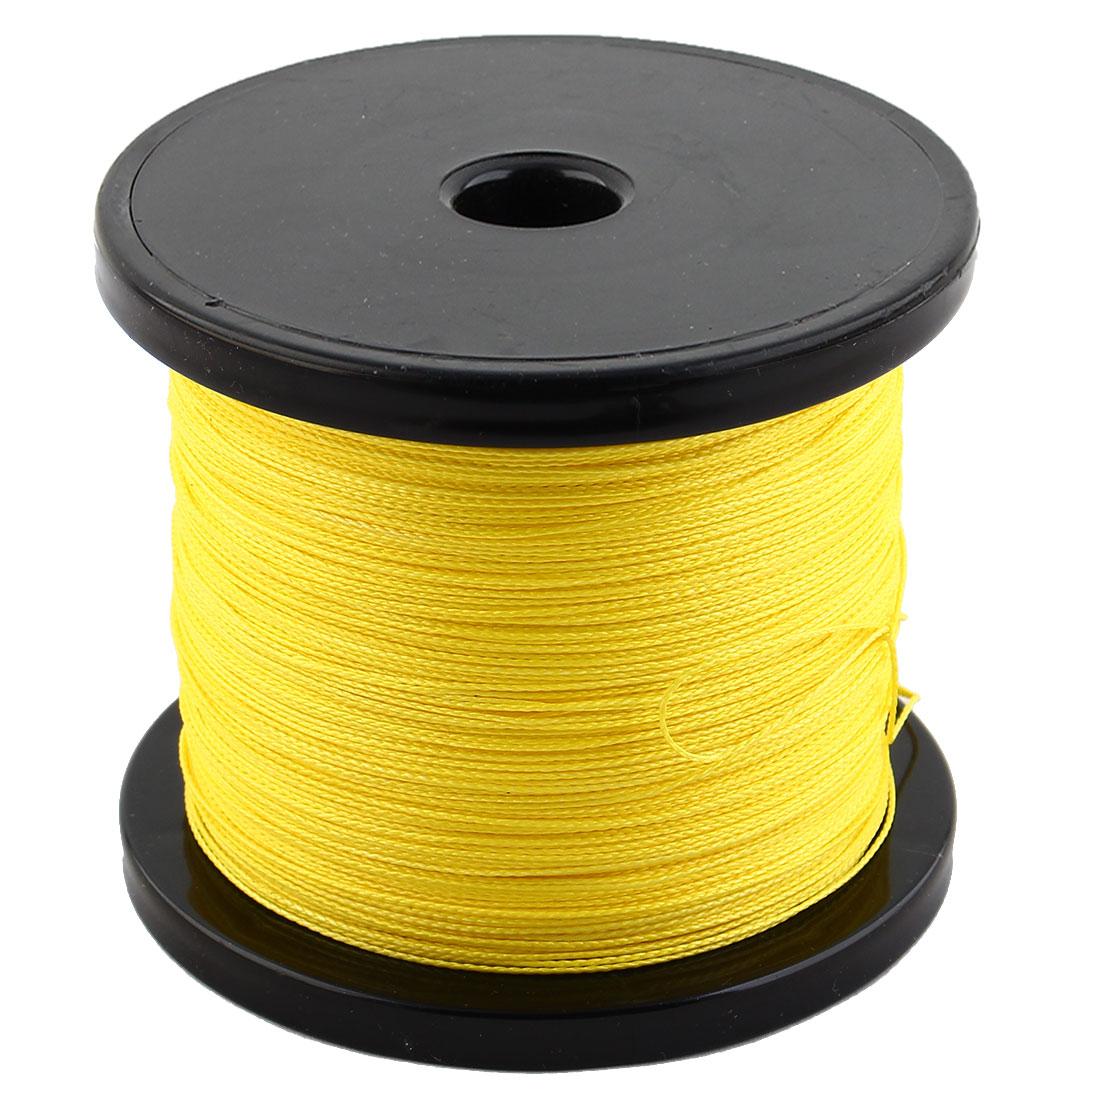 PE Braided Fishing Line Angling String Beading Thread Cord Yellow 500m Length